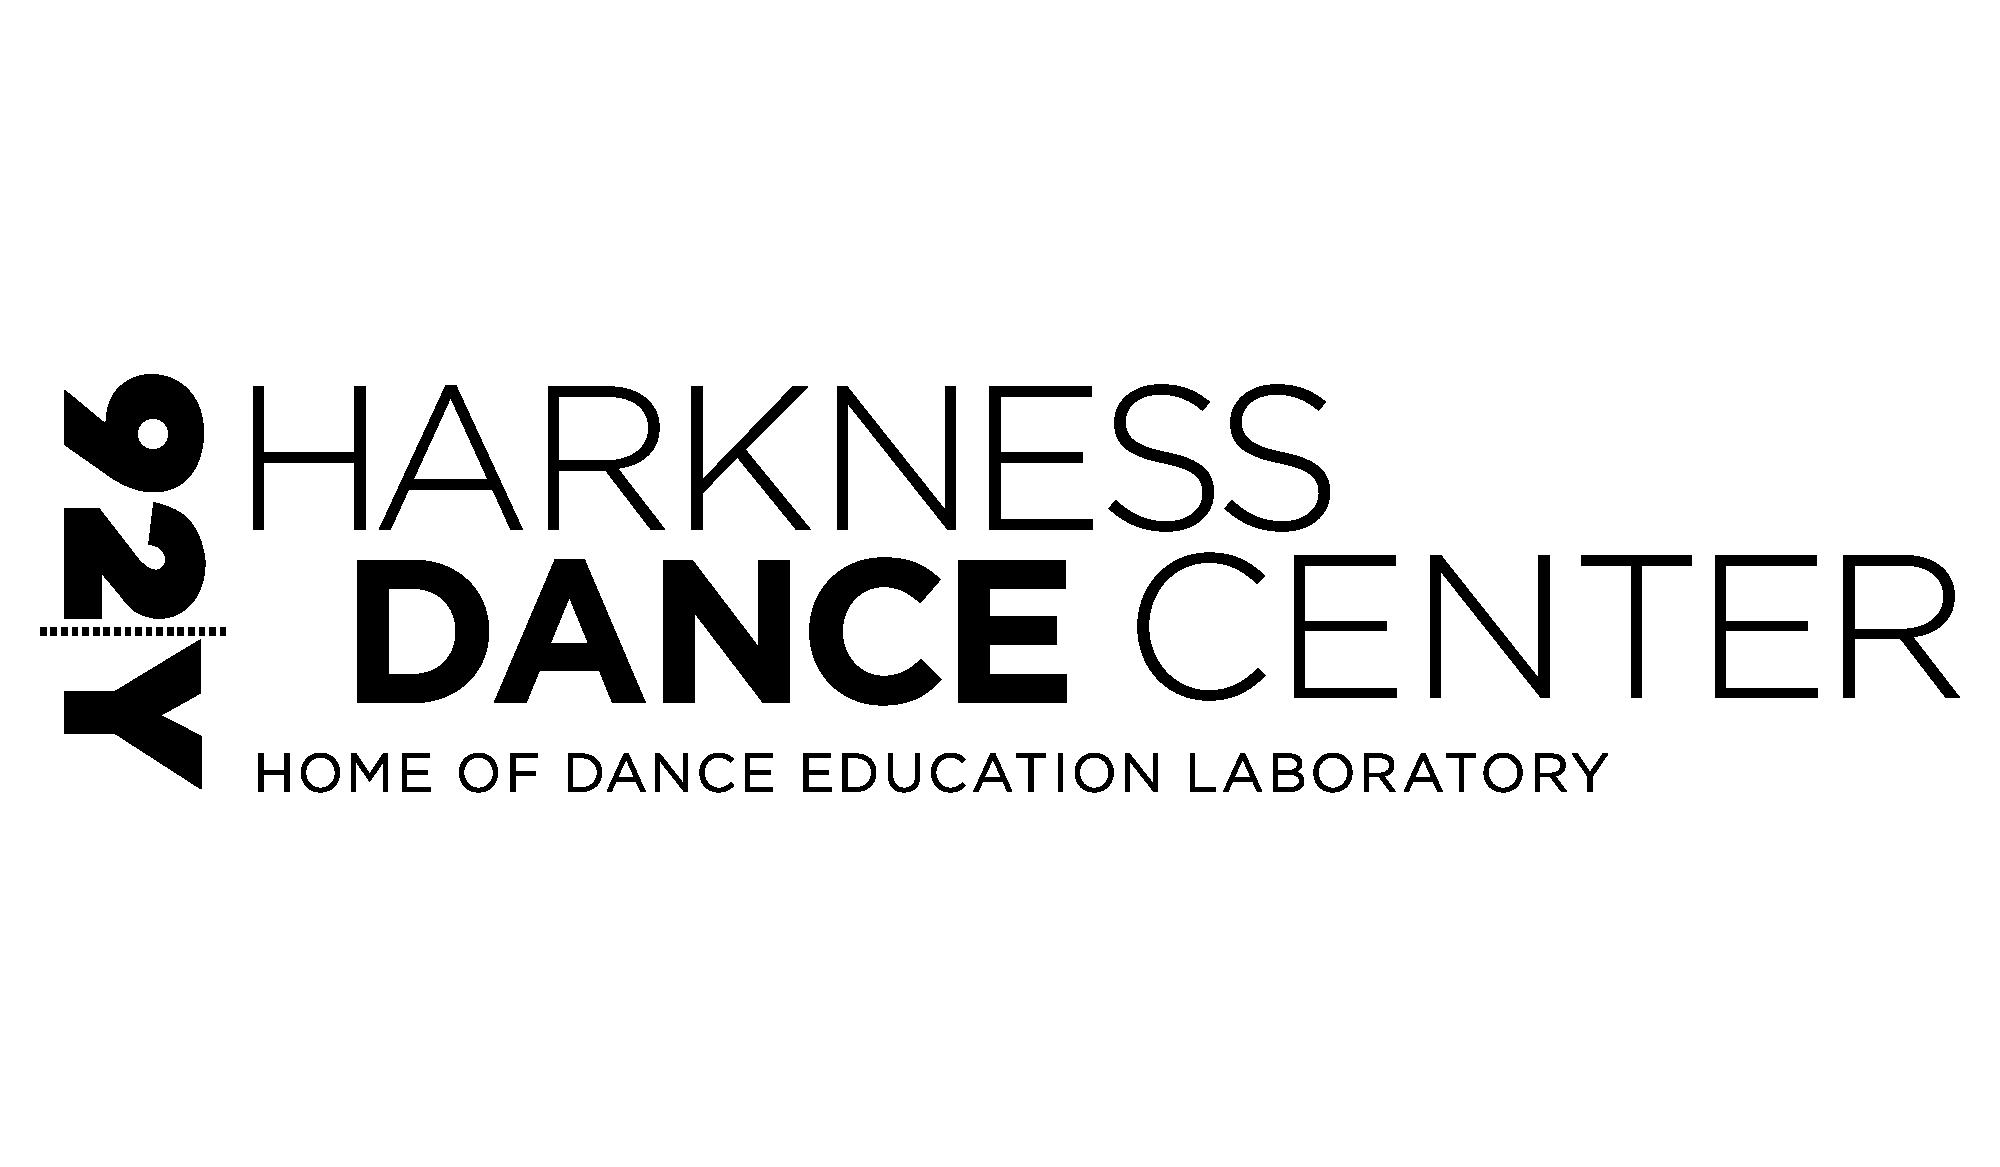 Suzi Tortora Logos_92Y Harkness Dance Center.png